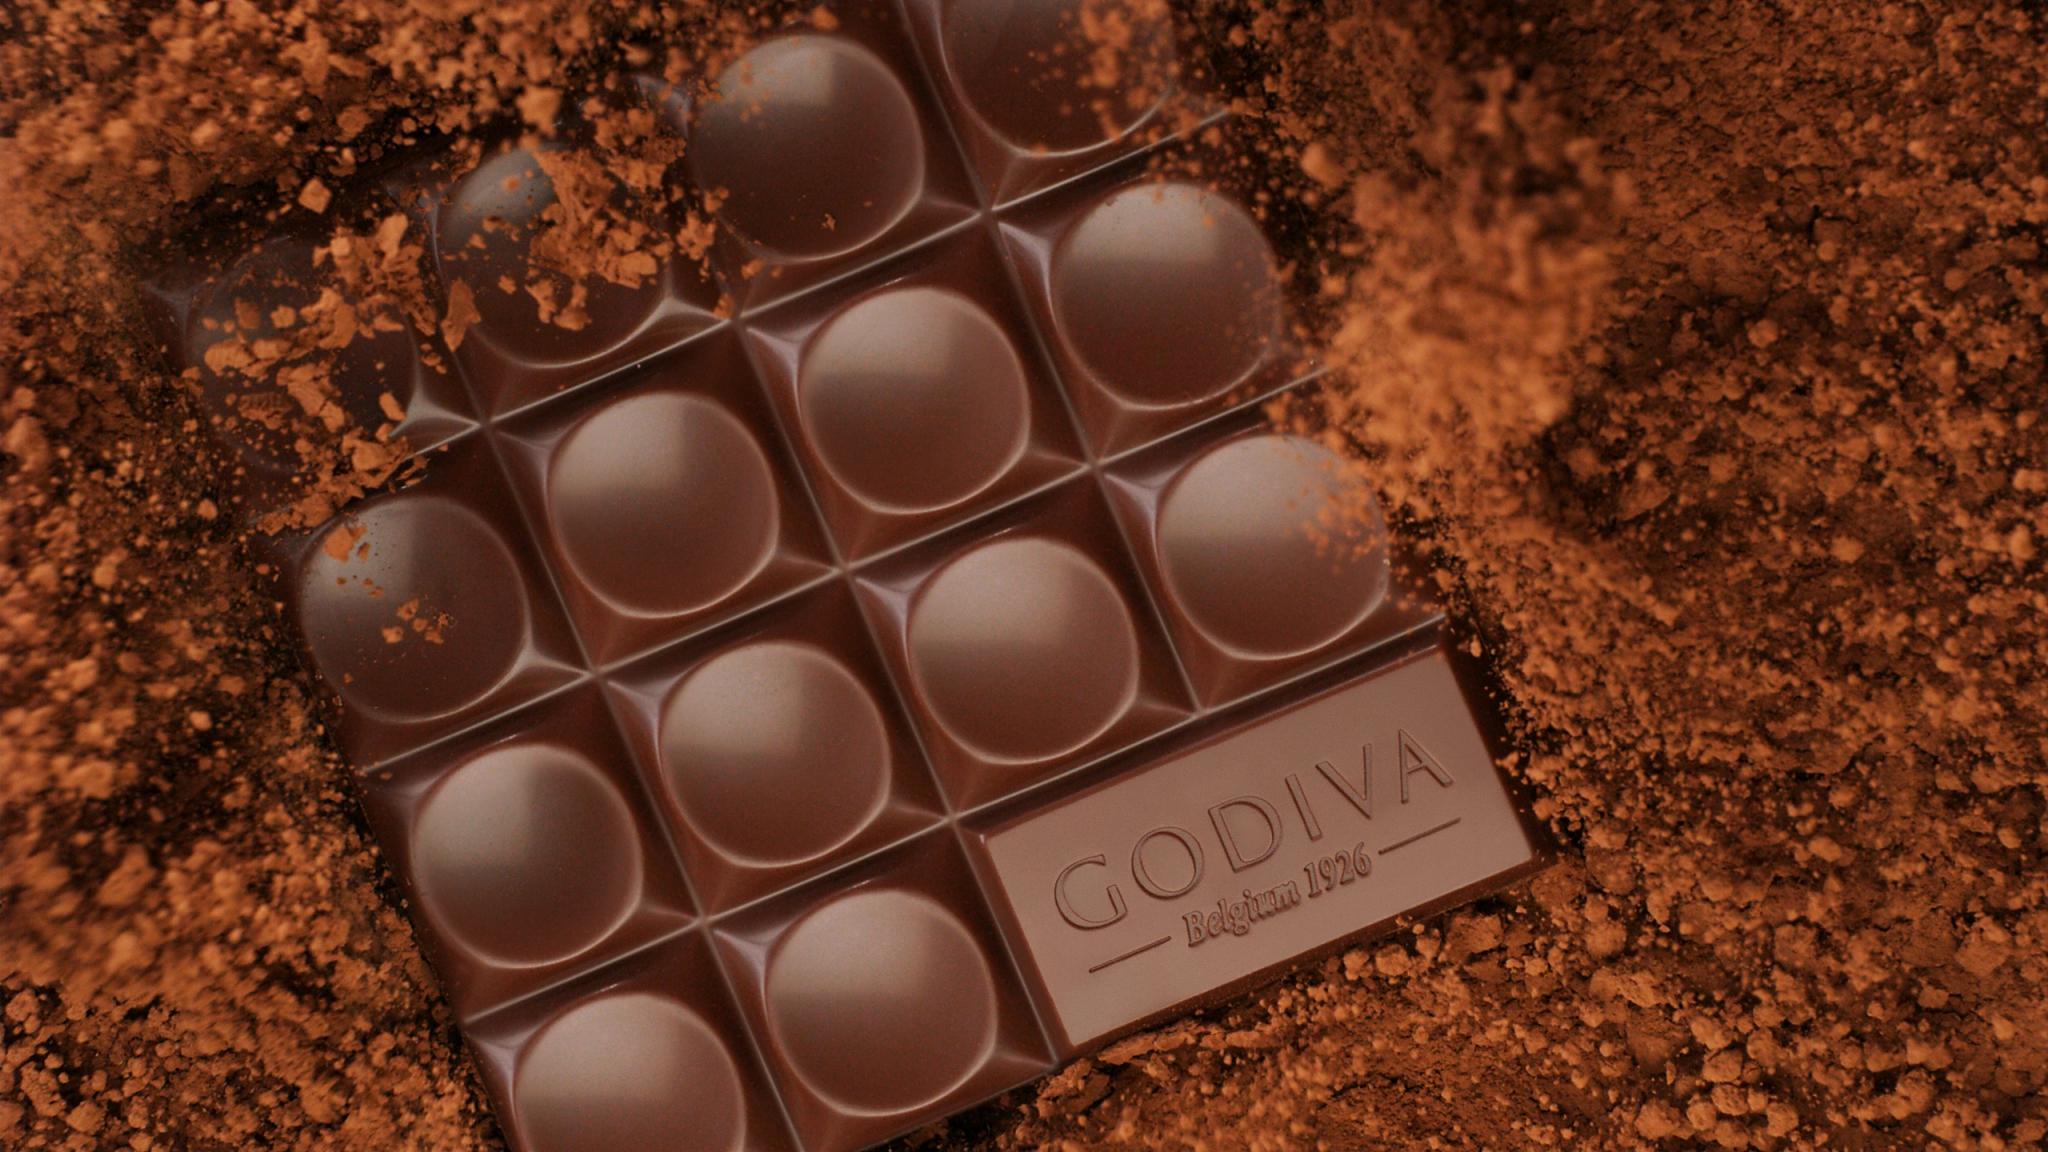 Godiva chocolate video directed by Lisa Shin